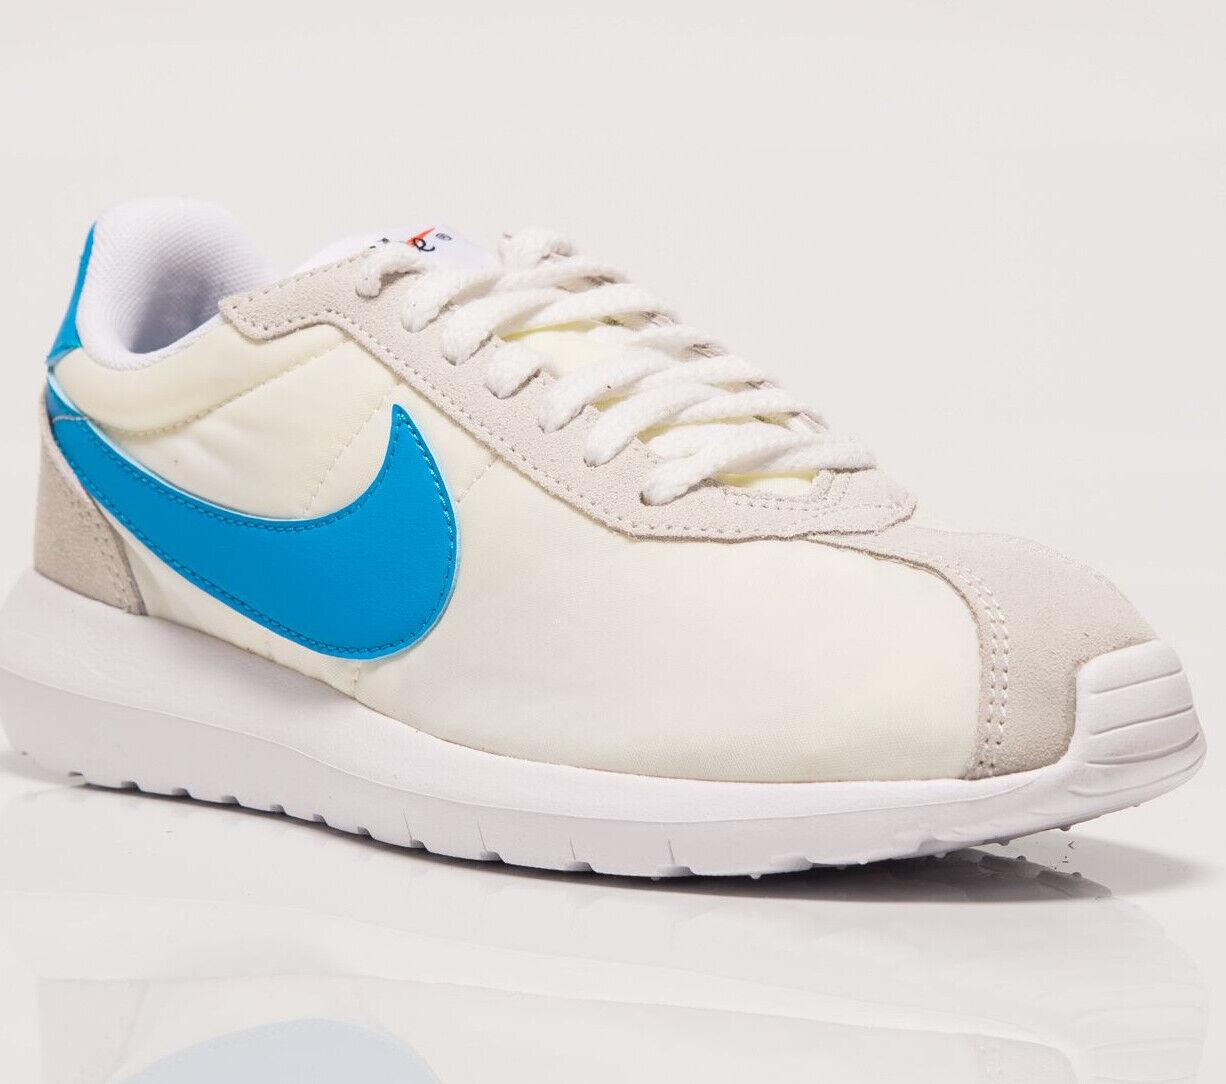 Nike Roshe LD-1000 Men's New Summit White shoes Last Sizes 8, 11 US 844266-104